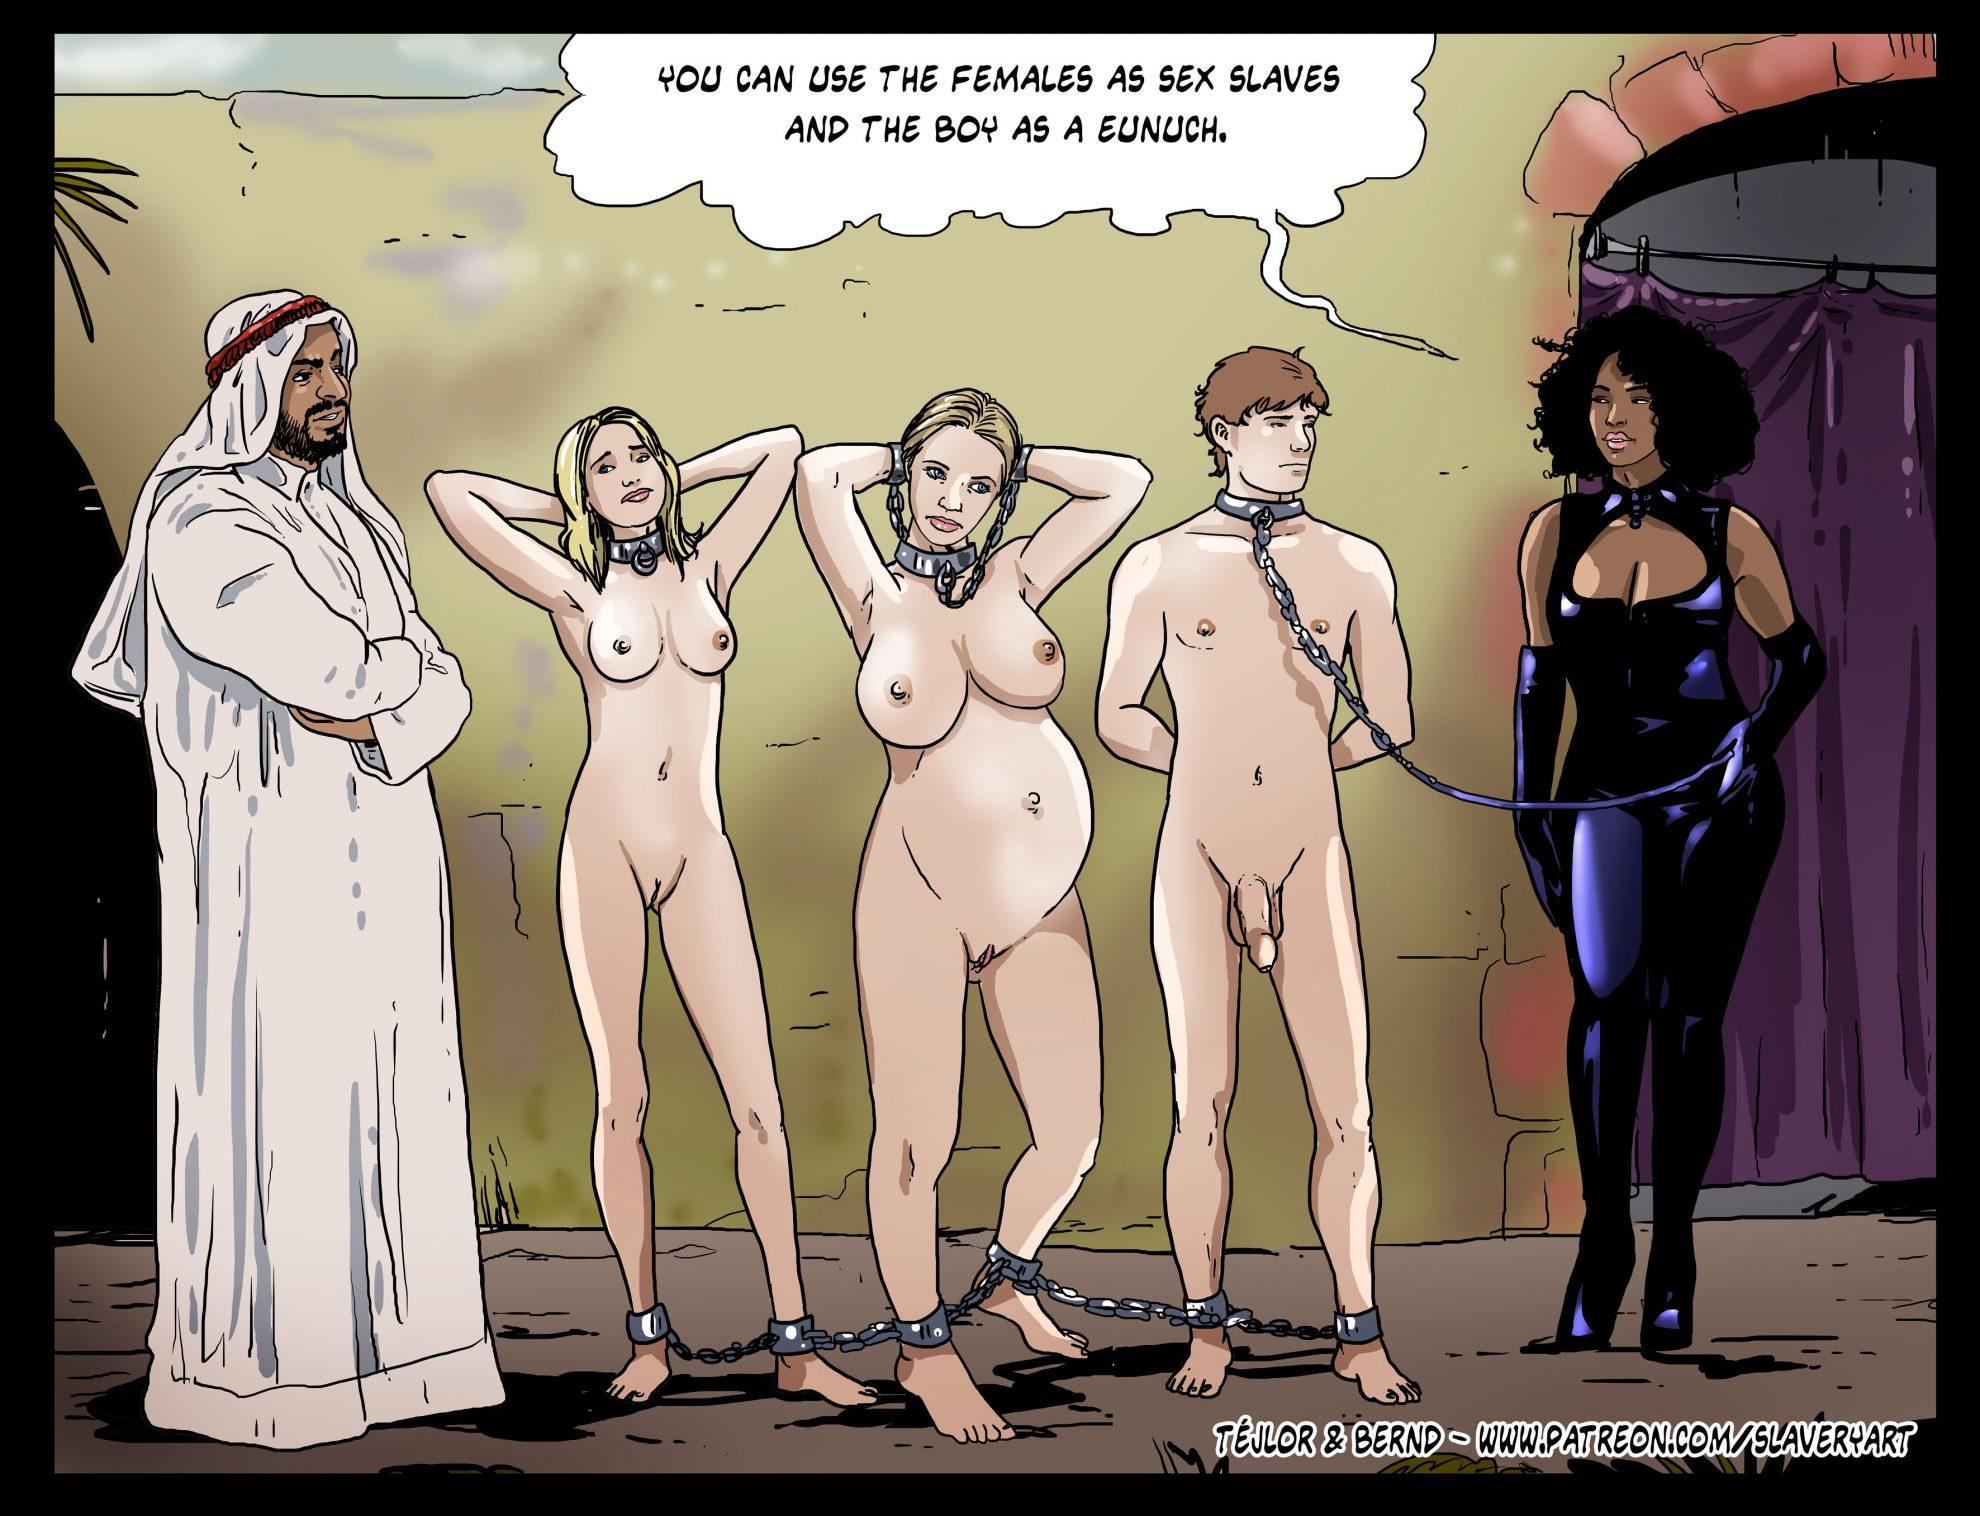 Girl sex slave cartoons